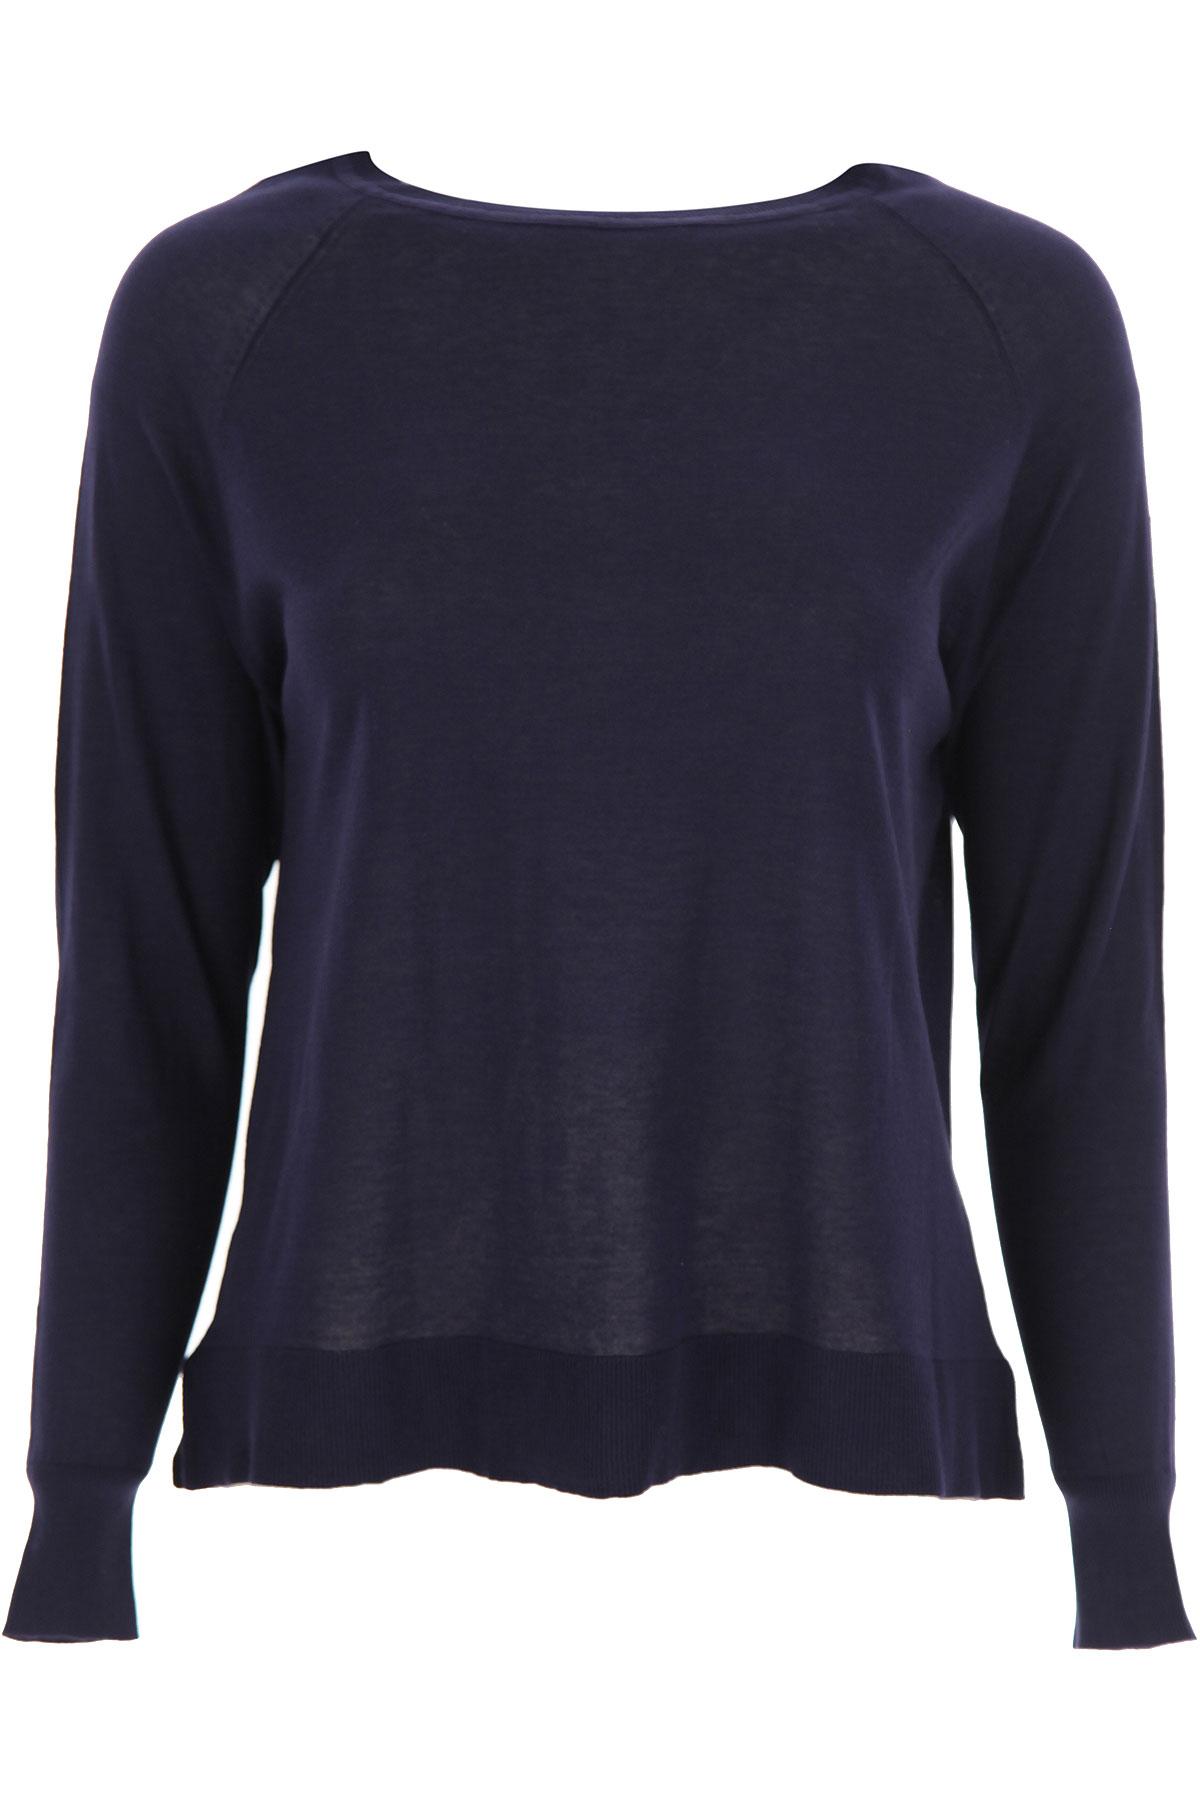 Aspesi Sweater for Women Jumper On Sale, Blue Navy, Cotton, 2019, 4 6